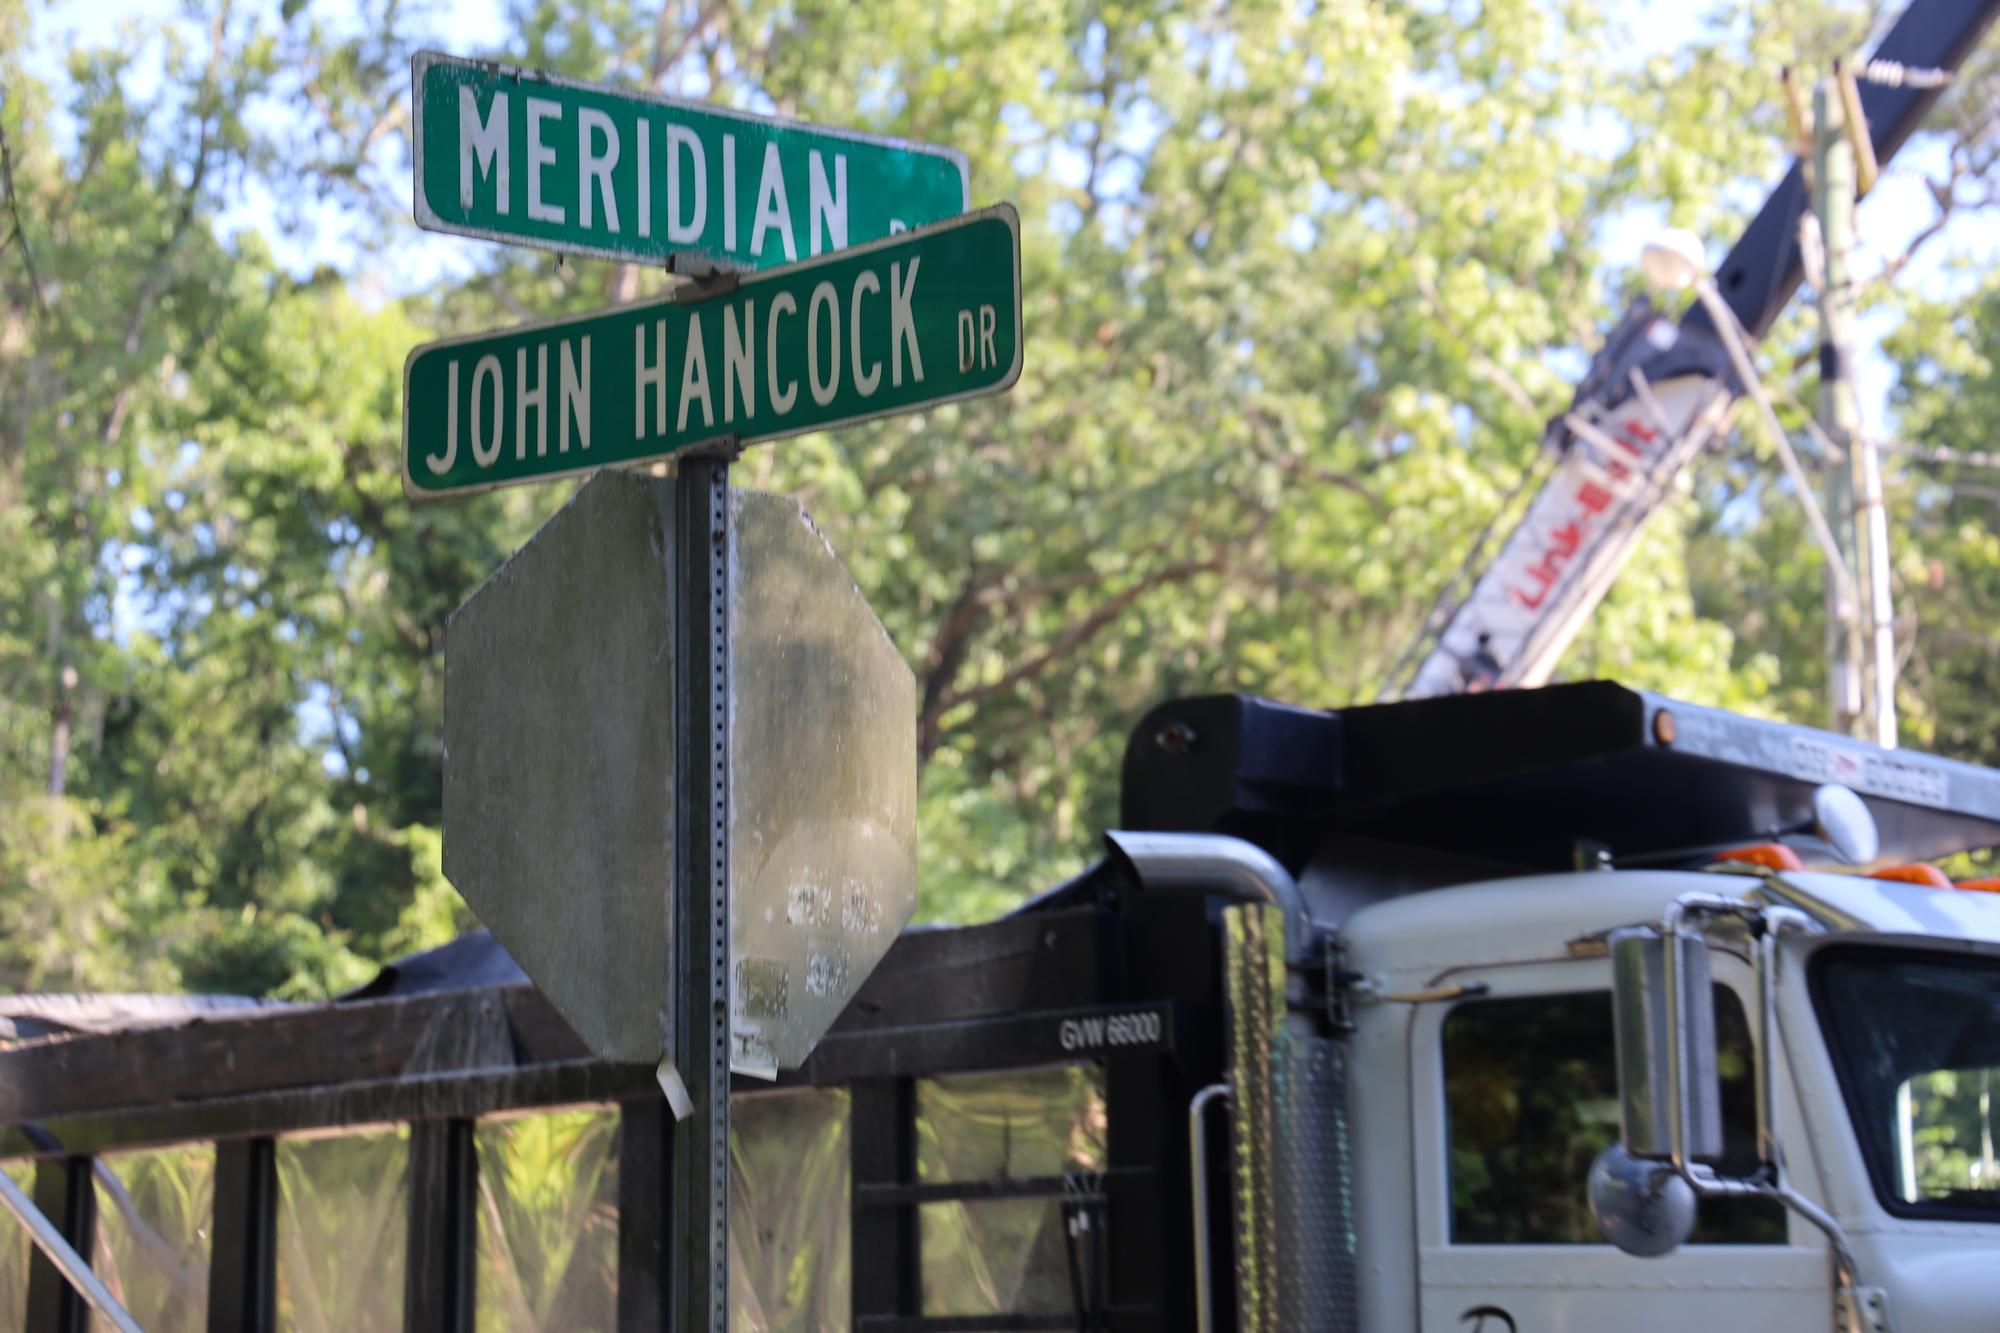 Meridian Construction